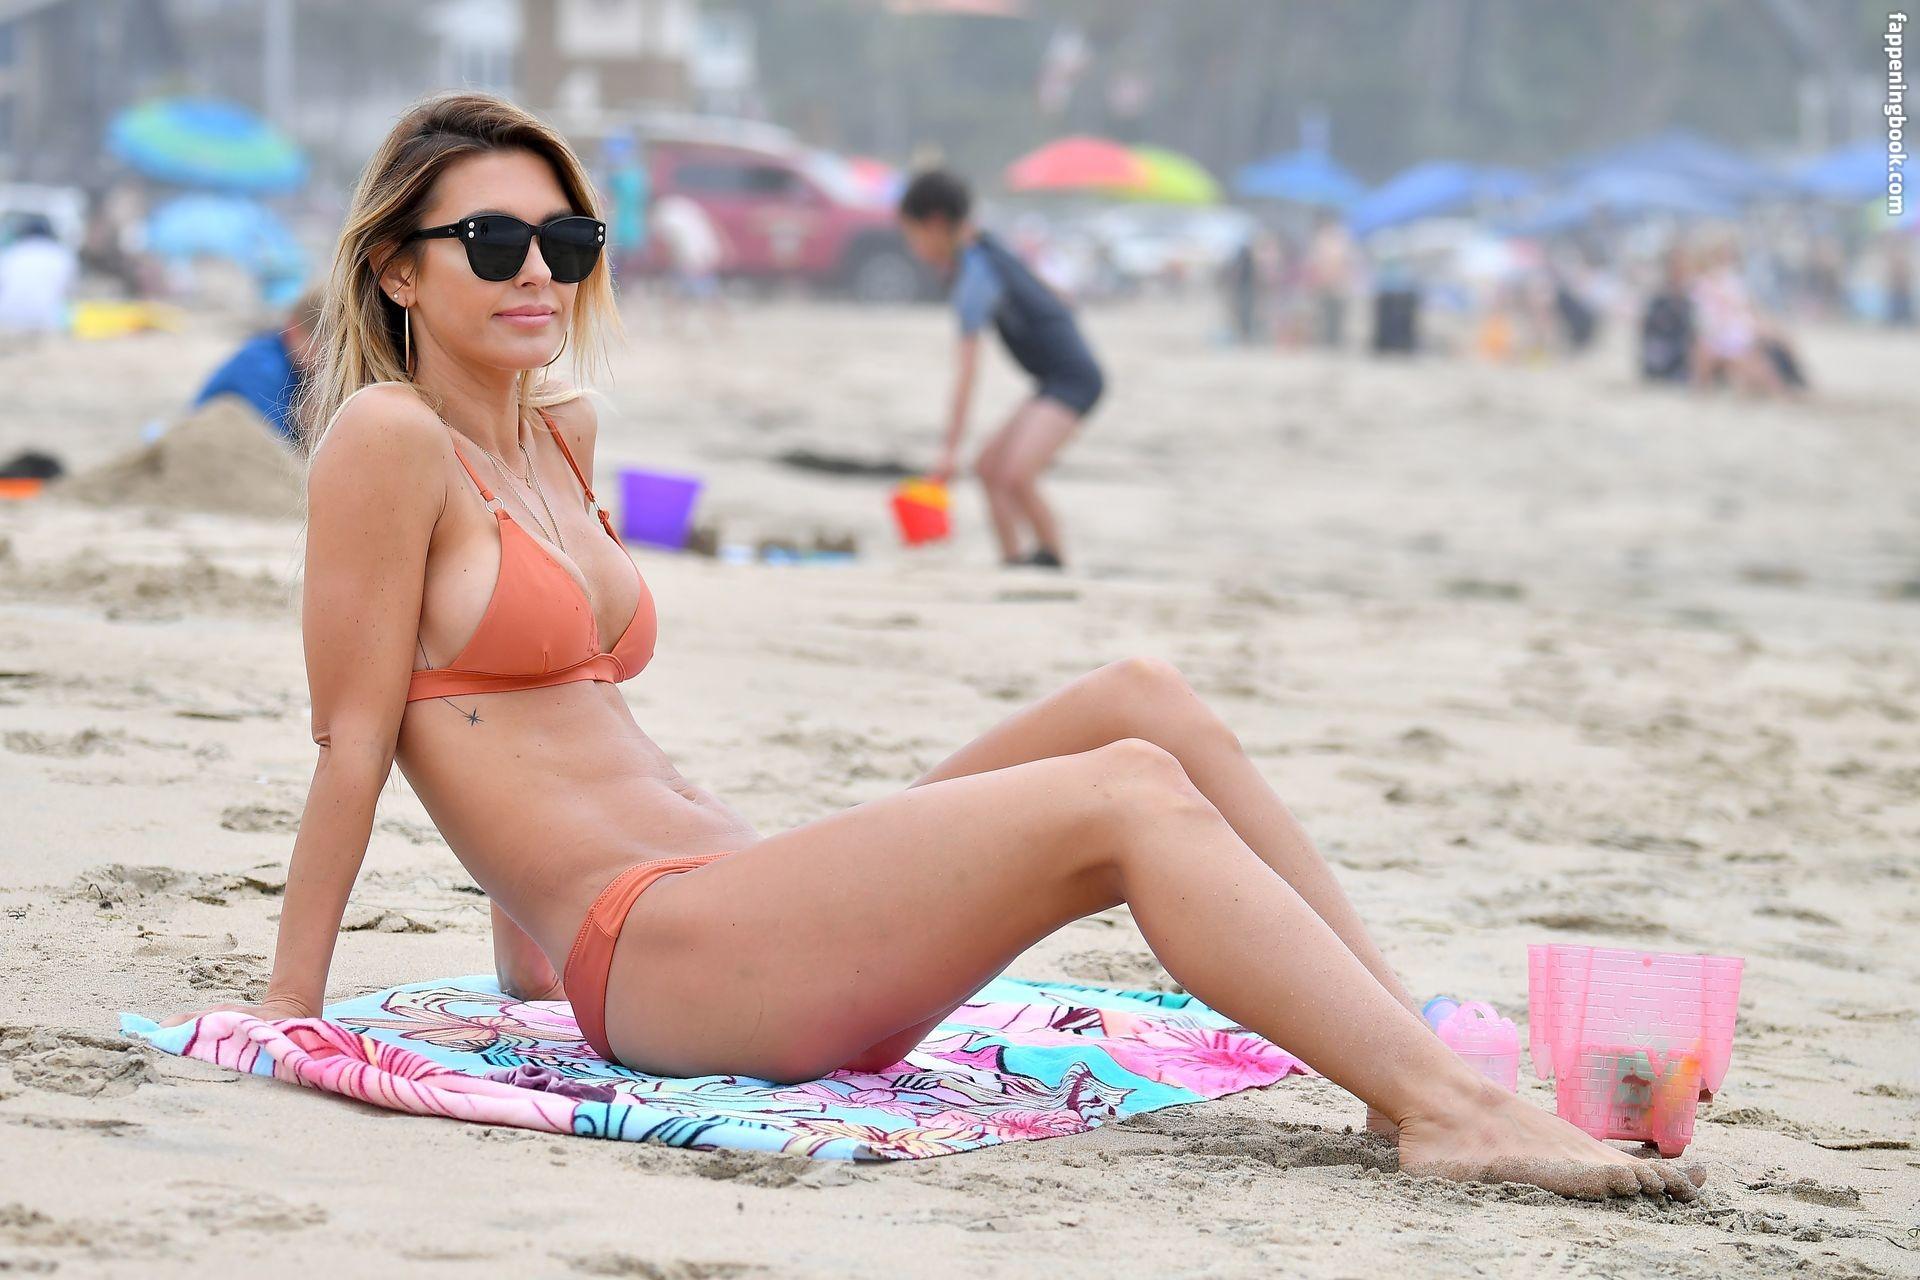 Angelina Pivarnick Nude Pics audrina patridge nude, sexy, the fappening, uncensored